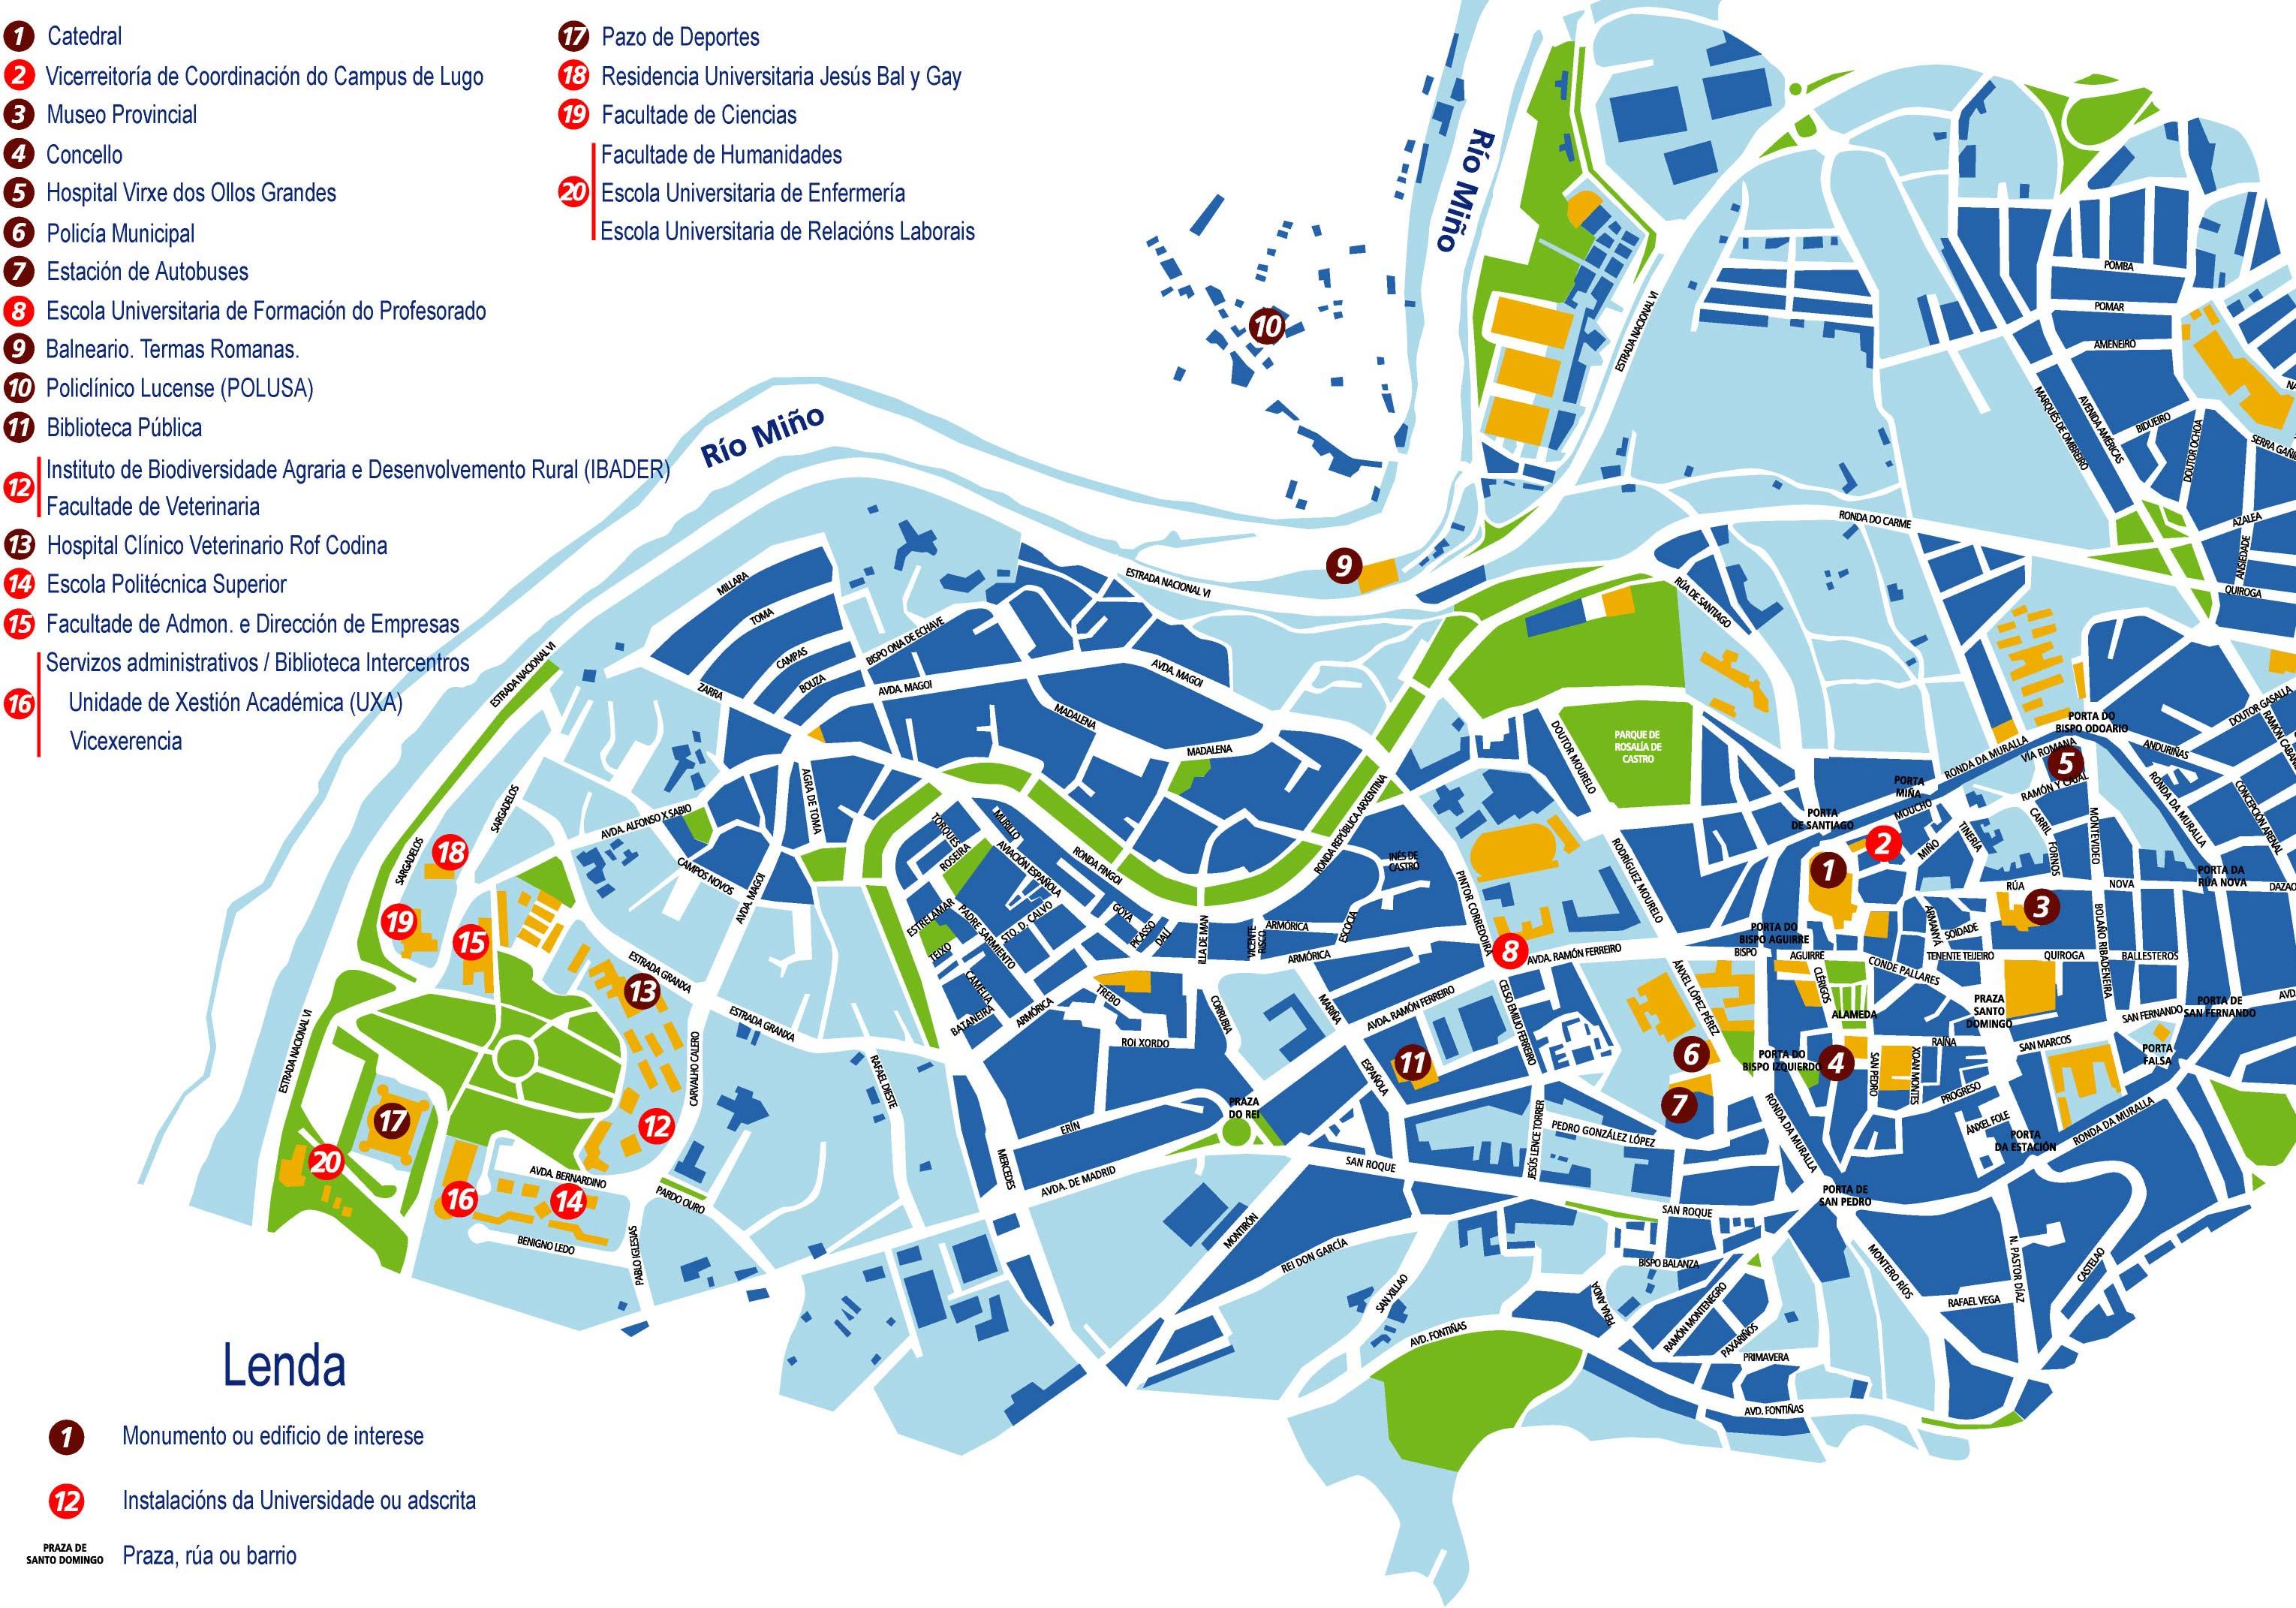 Callejero Mapa De Santiago De Compostela.Location And Maps Location And Maps Usc